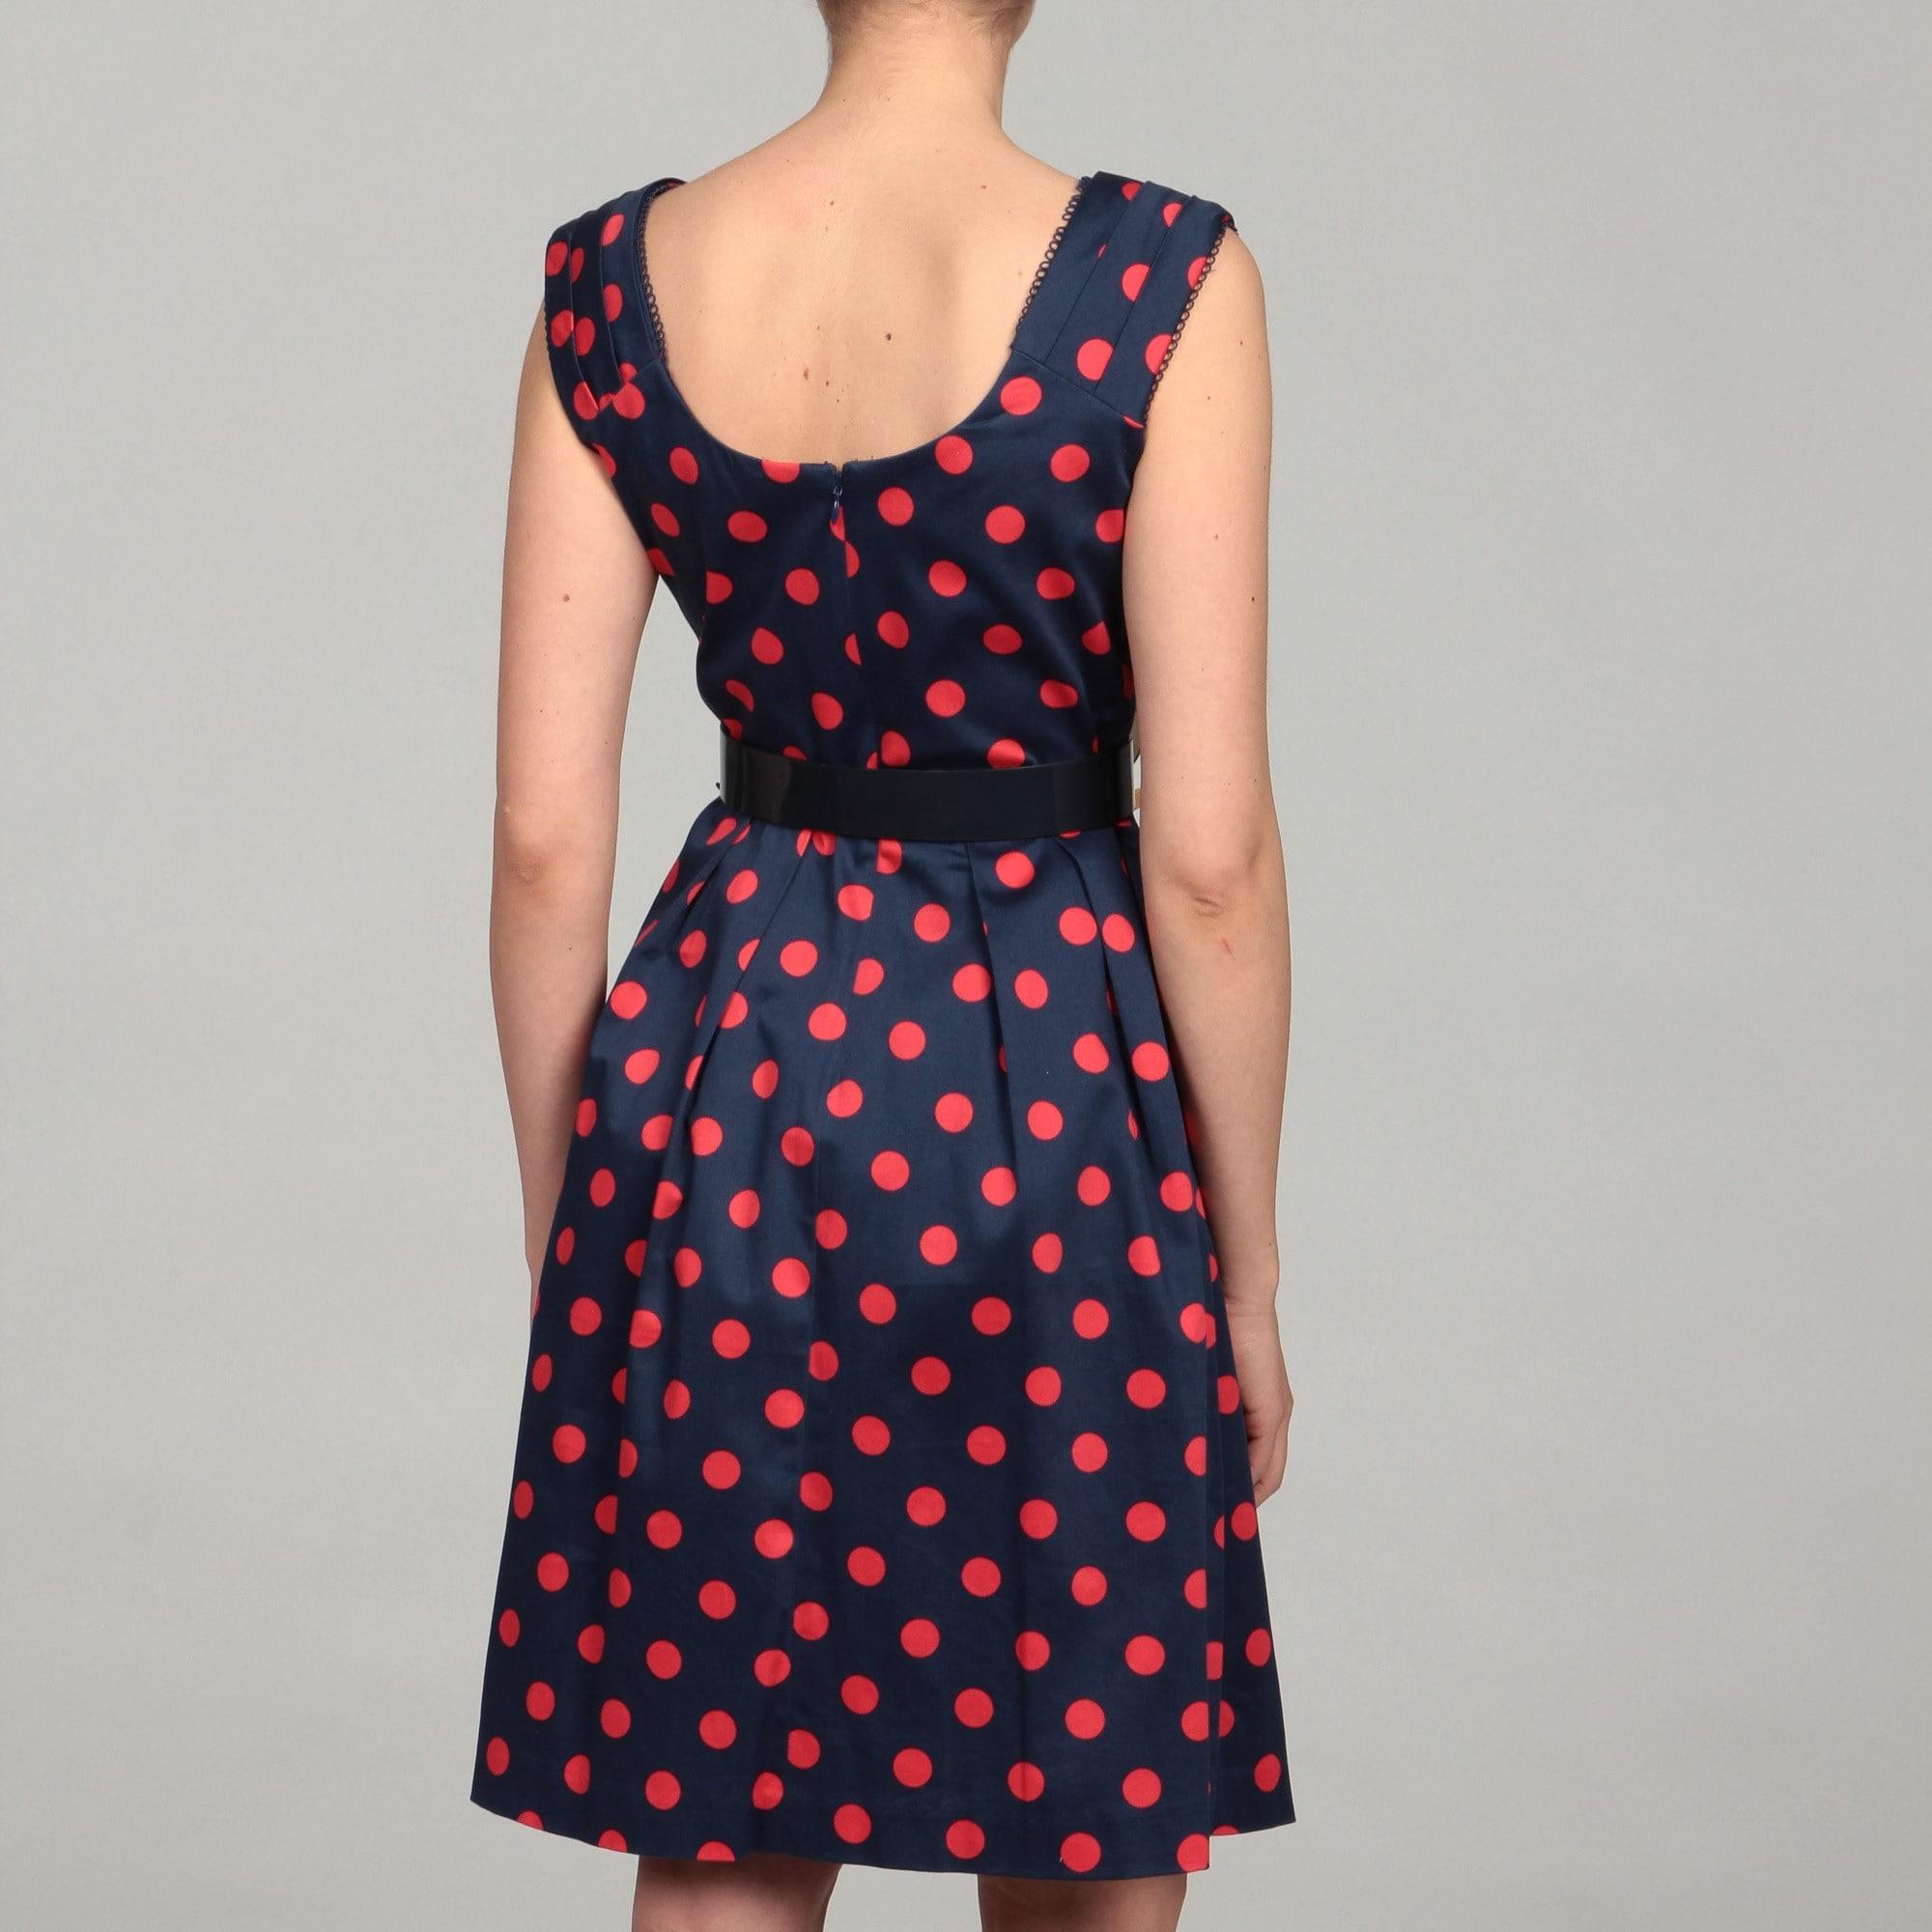 d0f6346ca5 Shop Chetta B Women s Polka Dot Belted Dress - Free Shipping Today ...